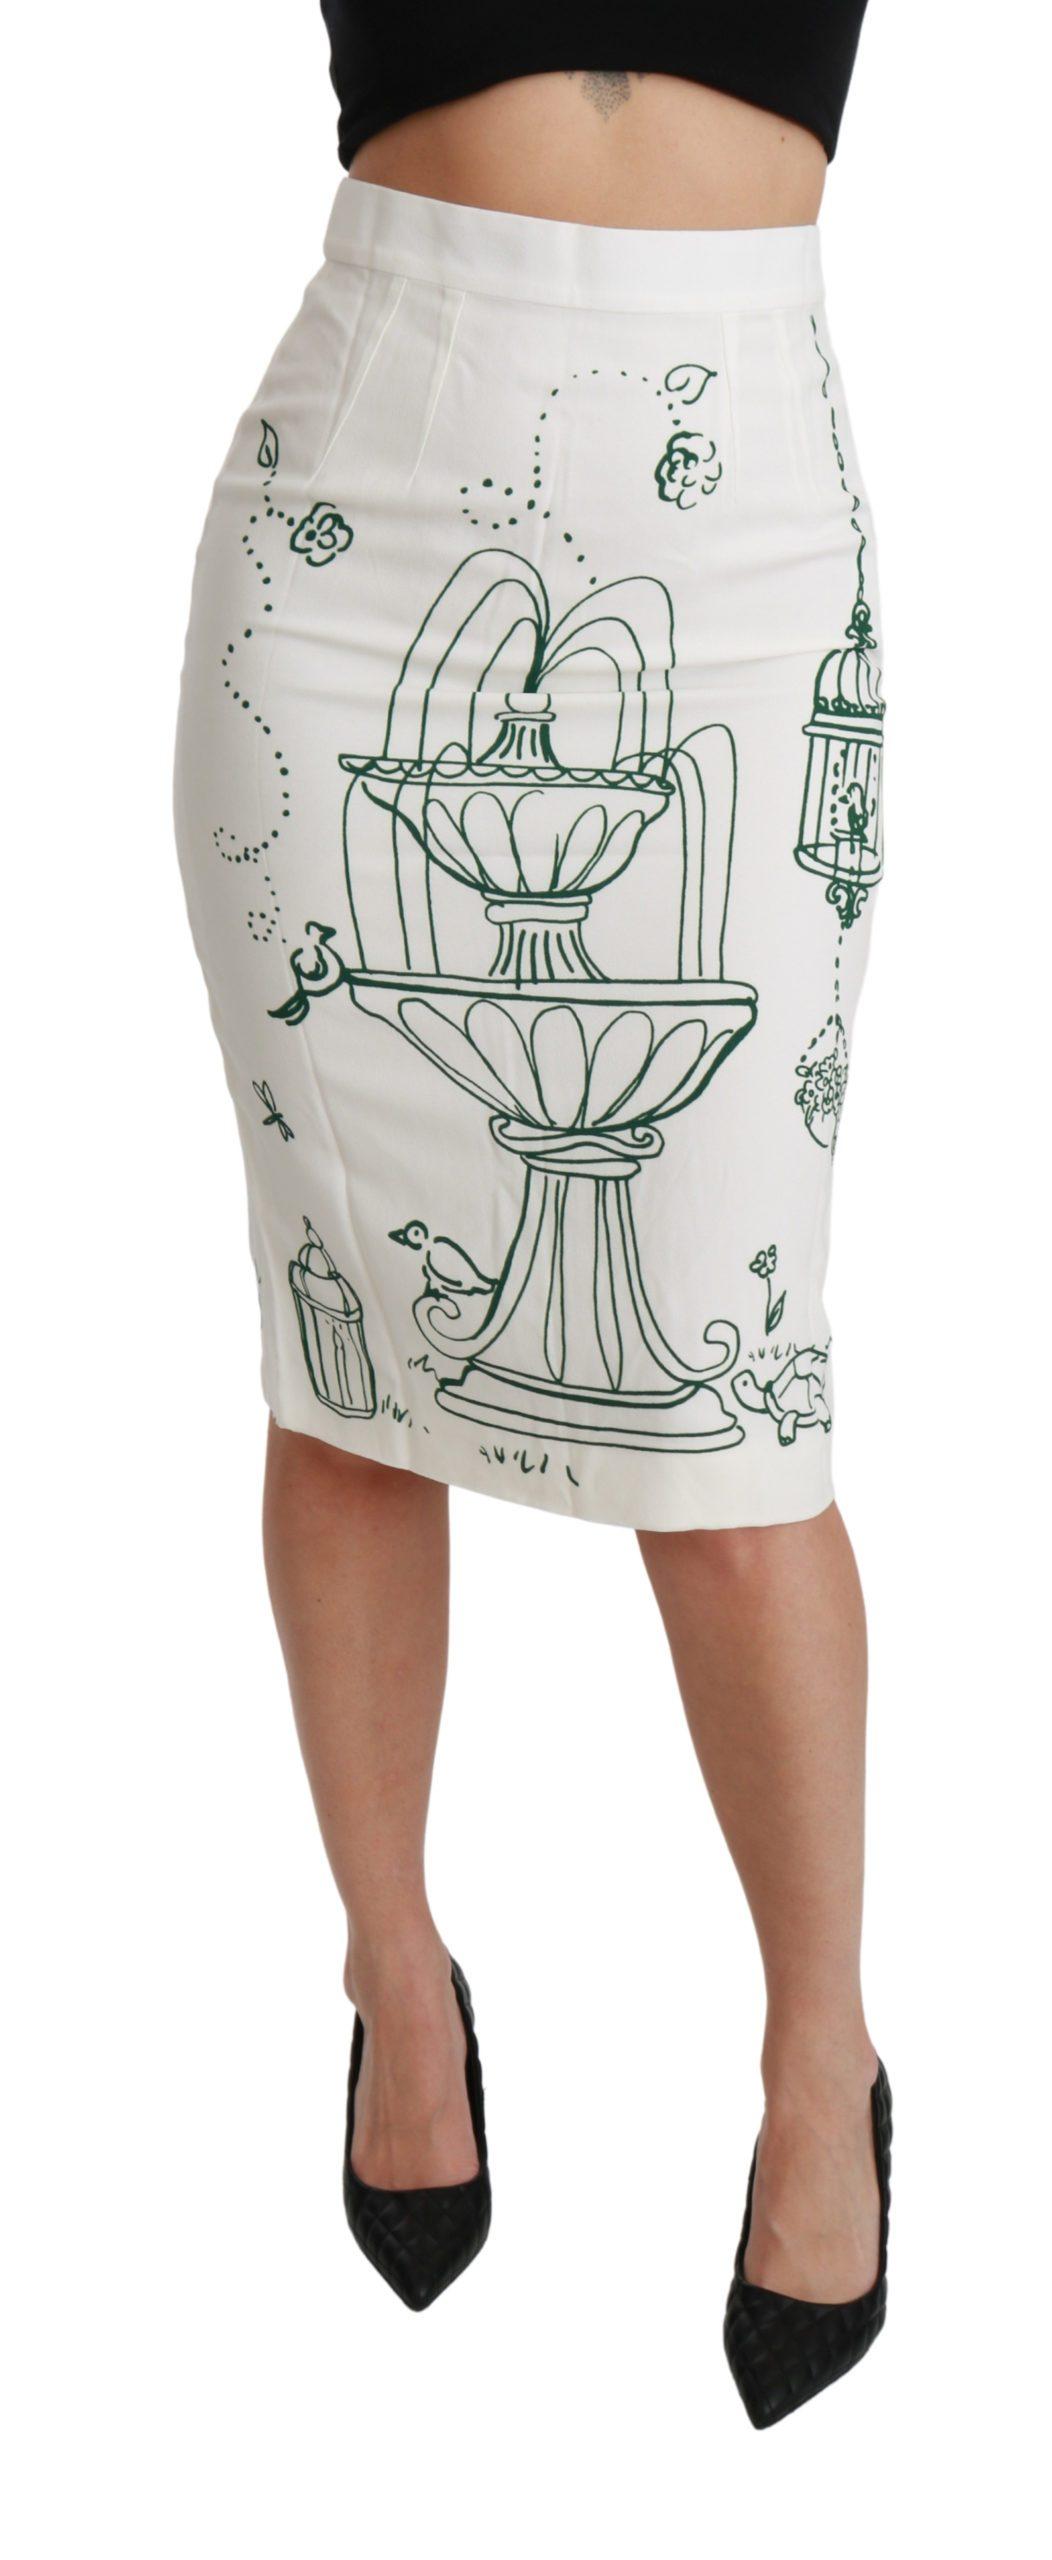 Dolce & Gabbana Women's Fairy Tale Print Stretch White Skirt Green SKI1435 - IT38 XS